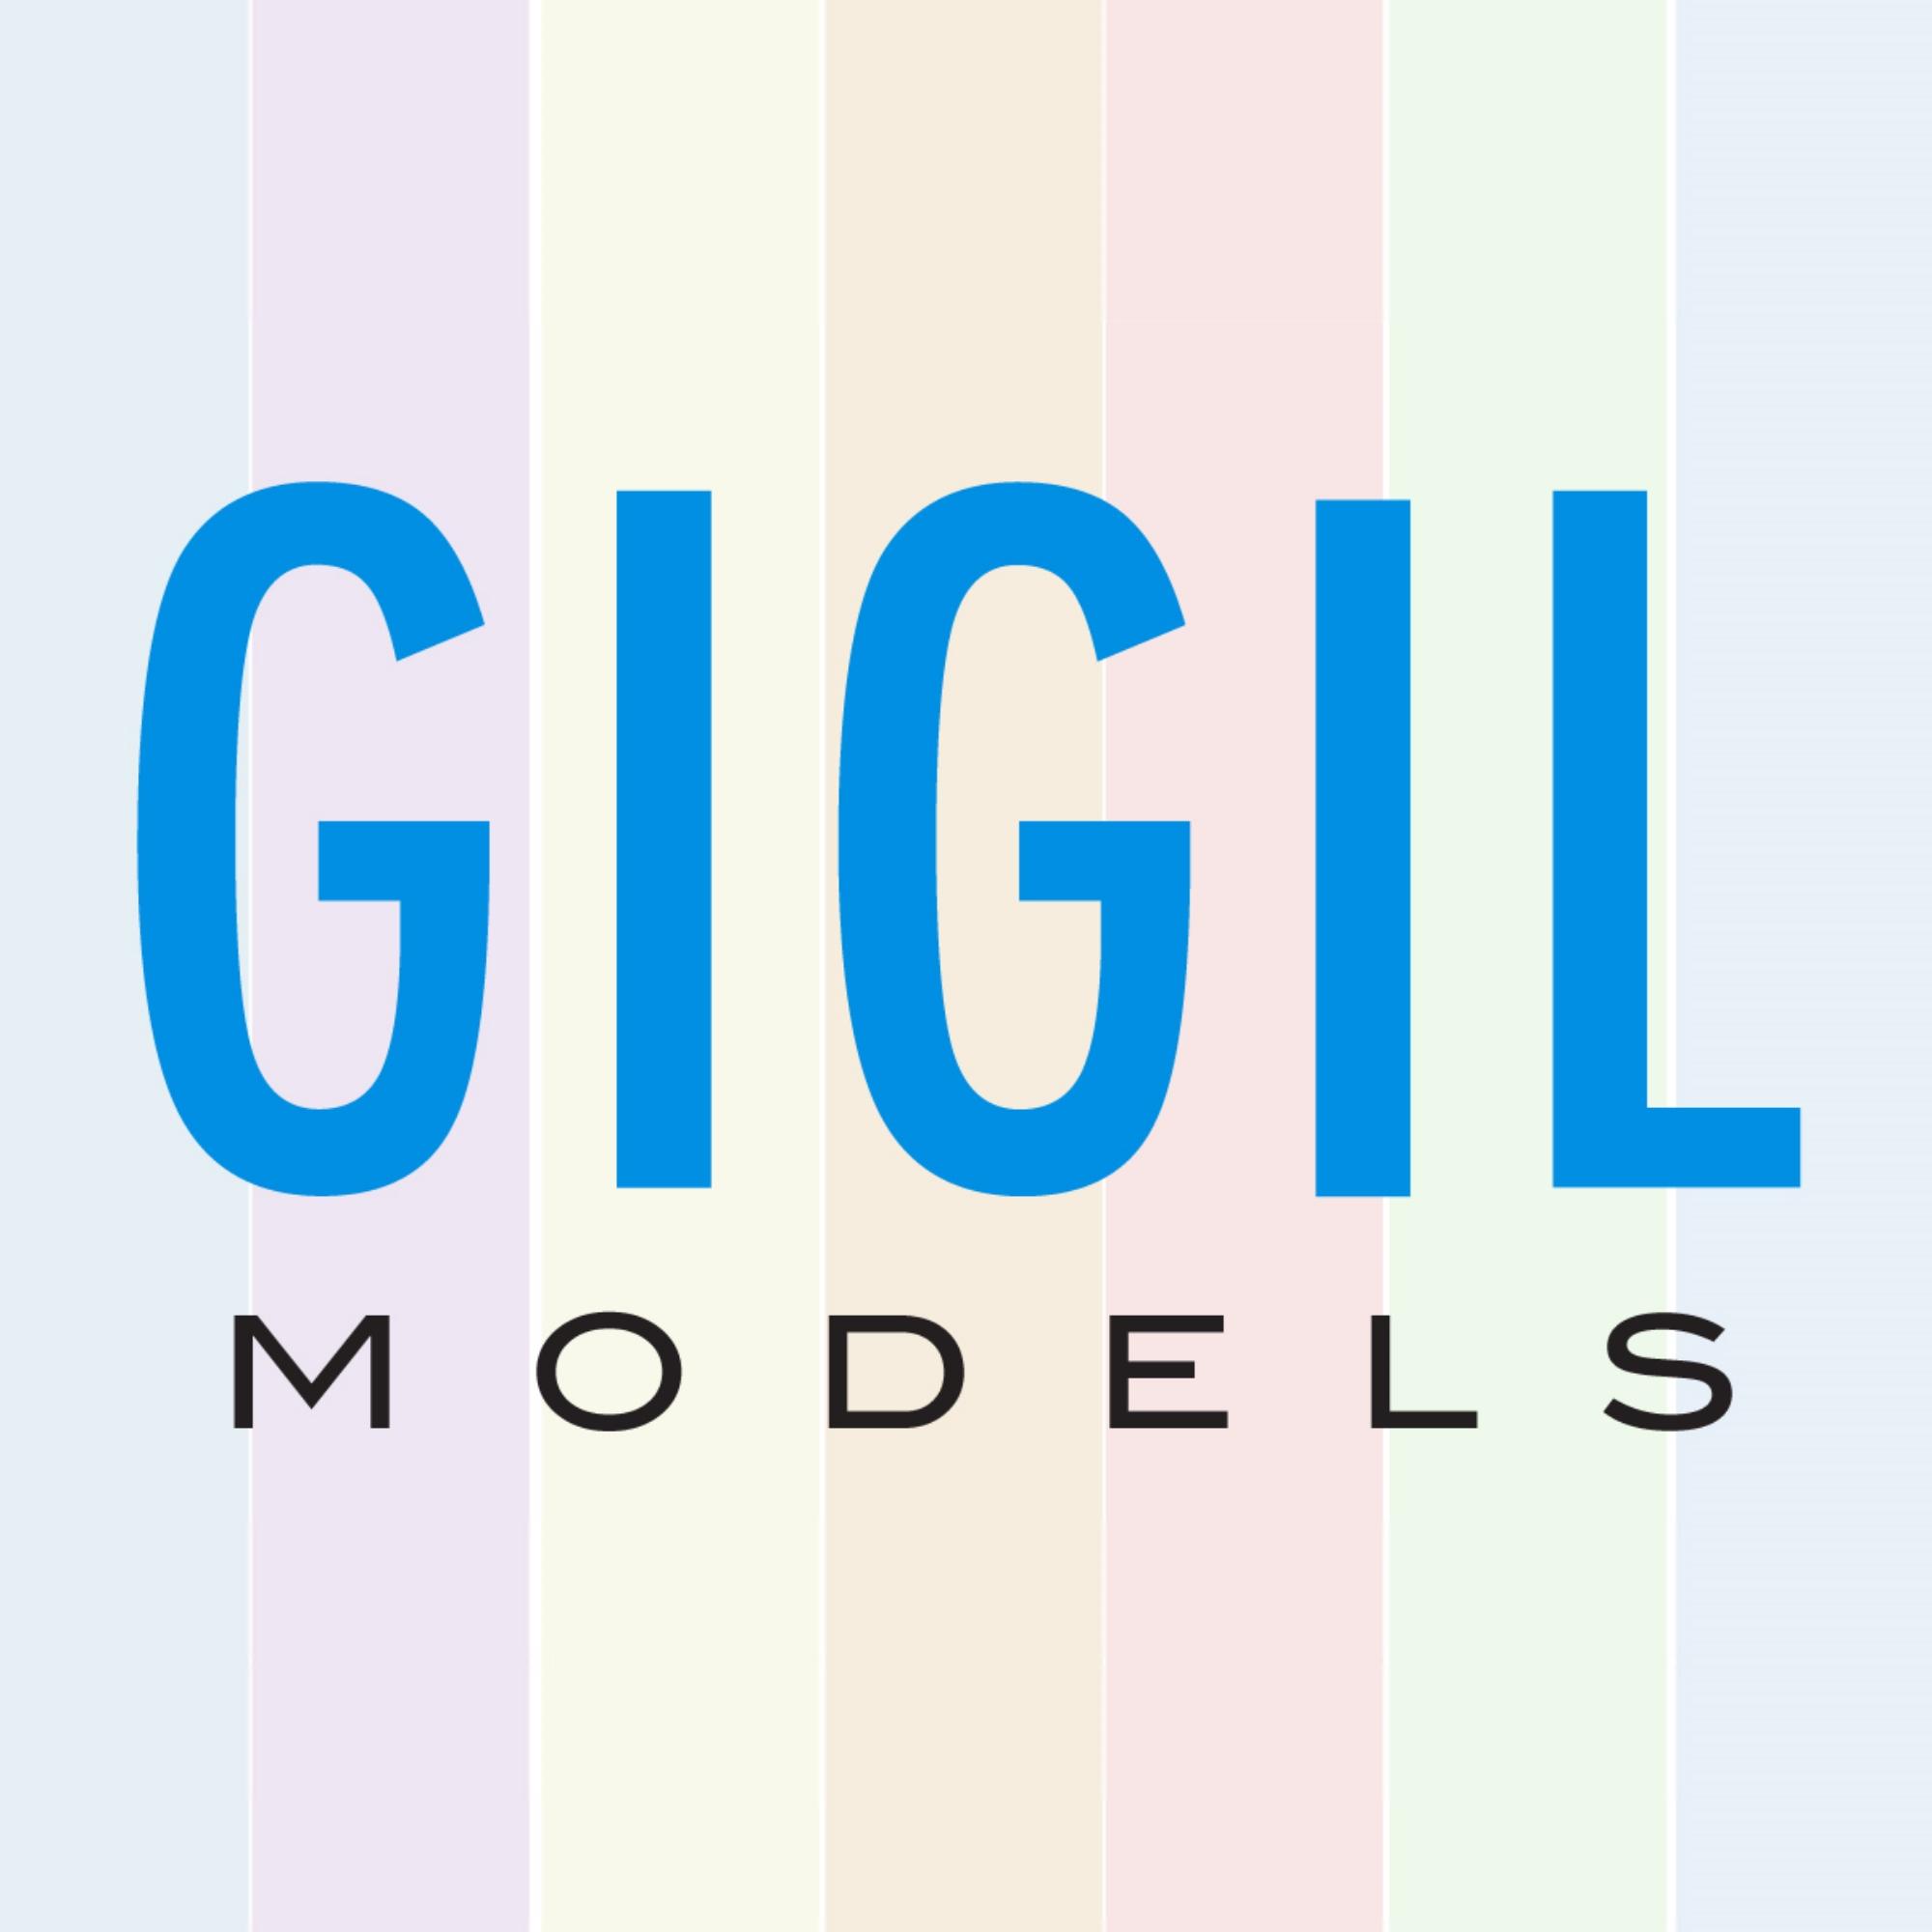 Gigil Models